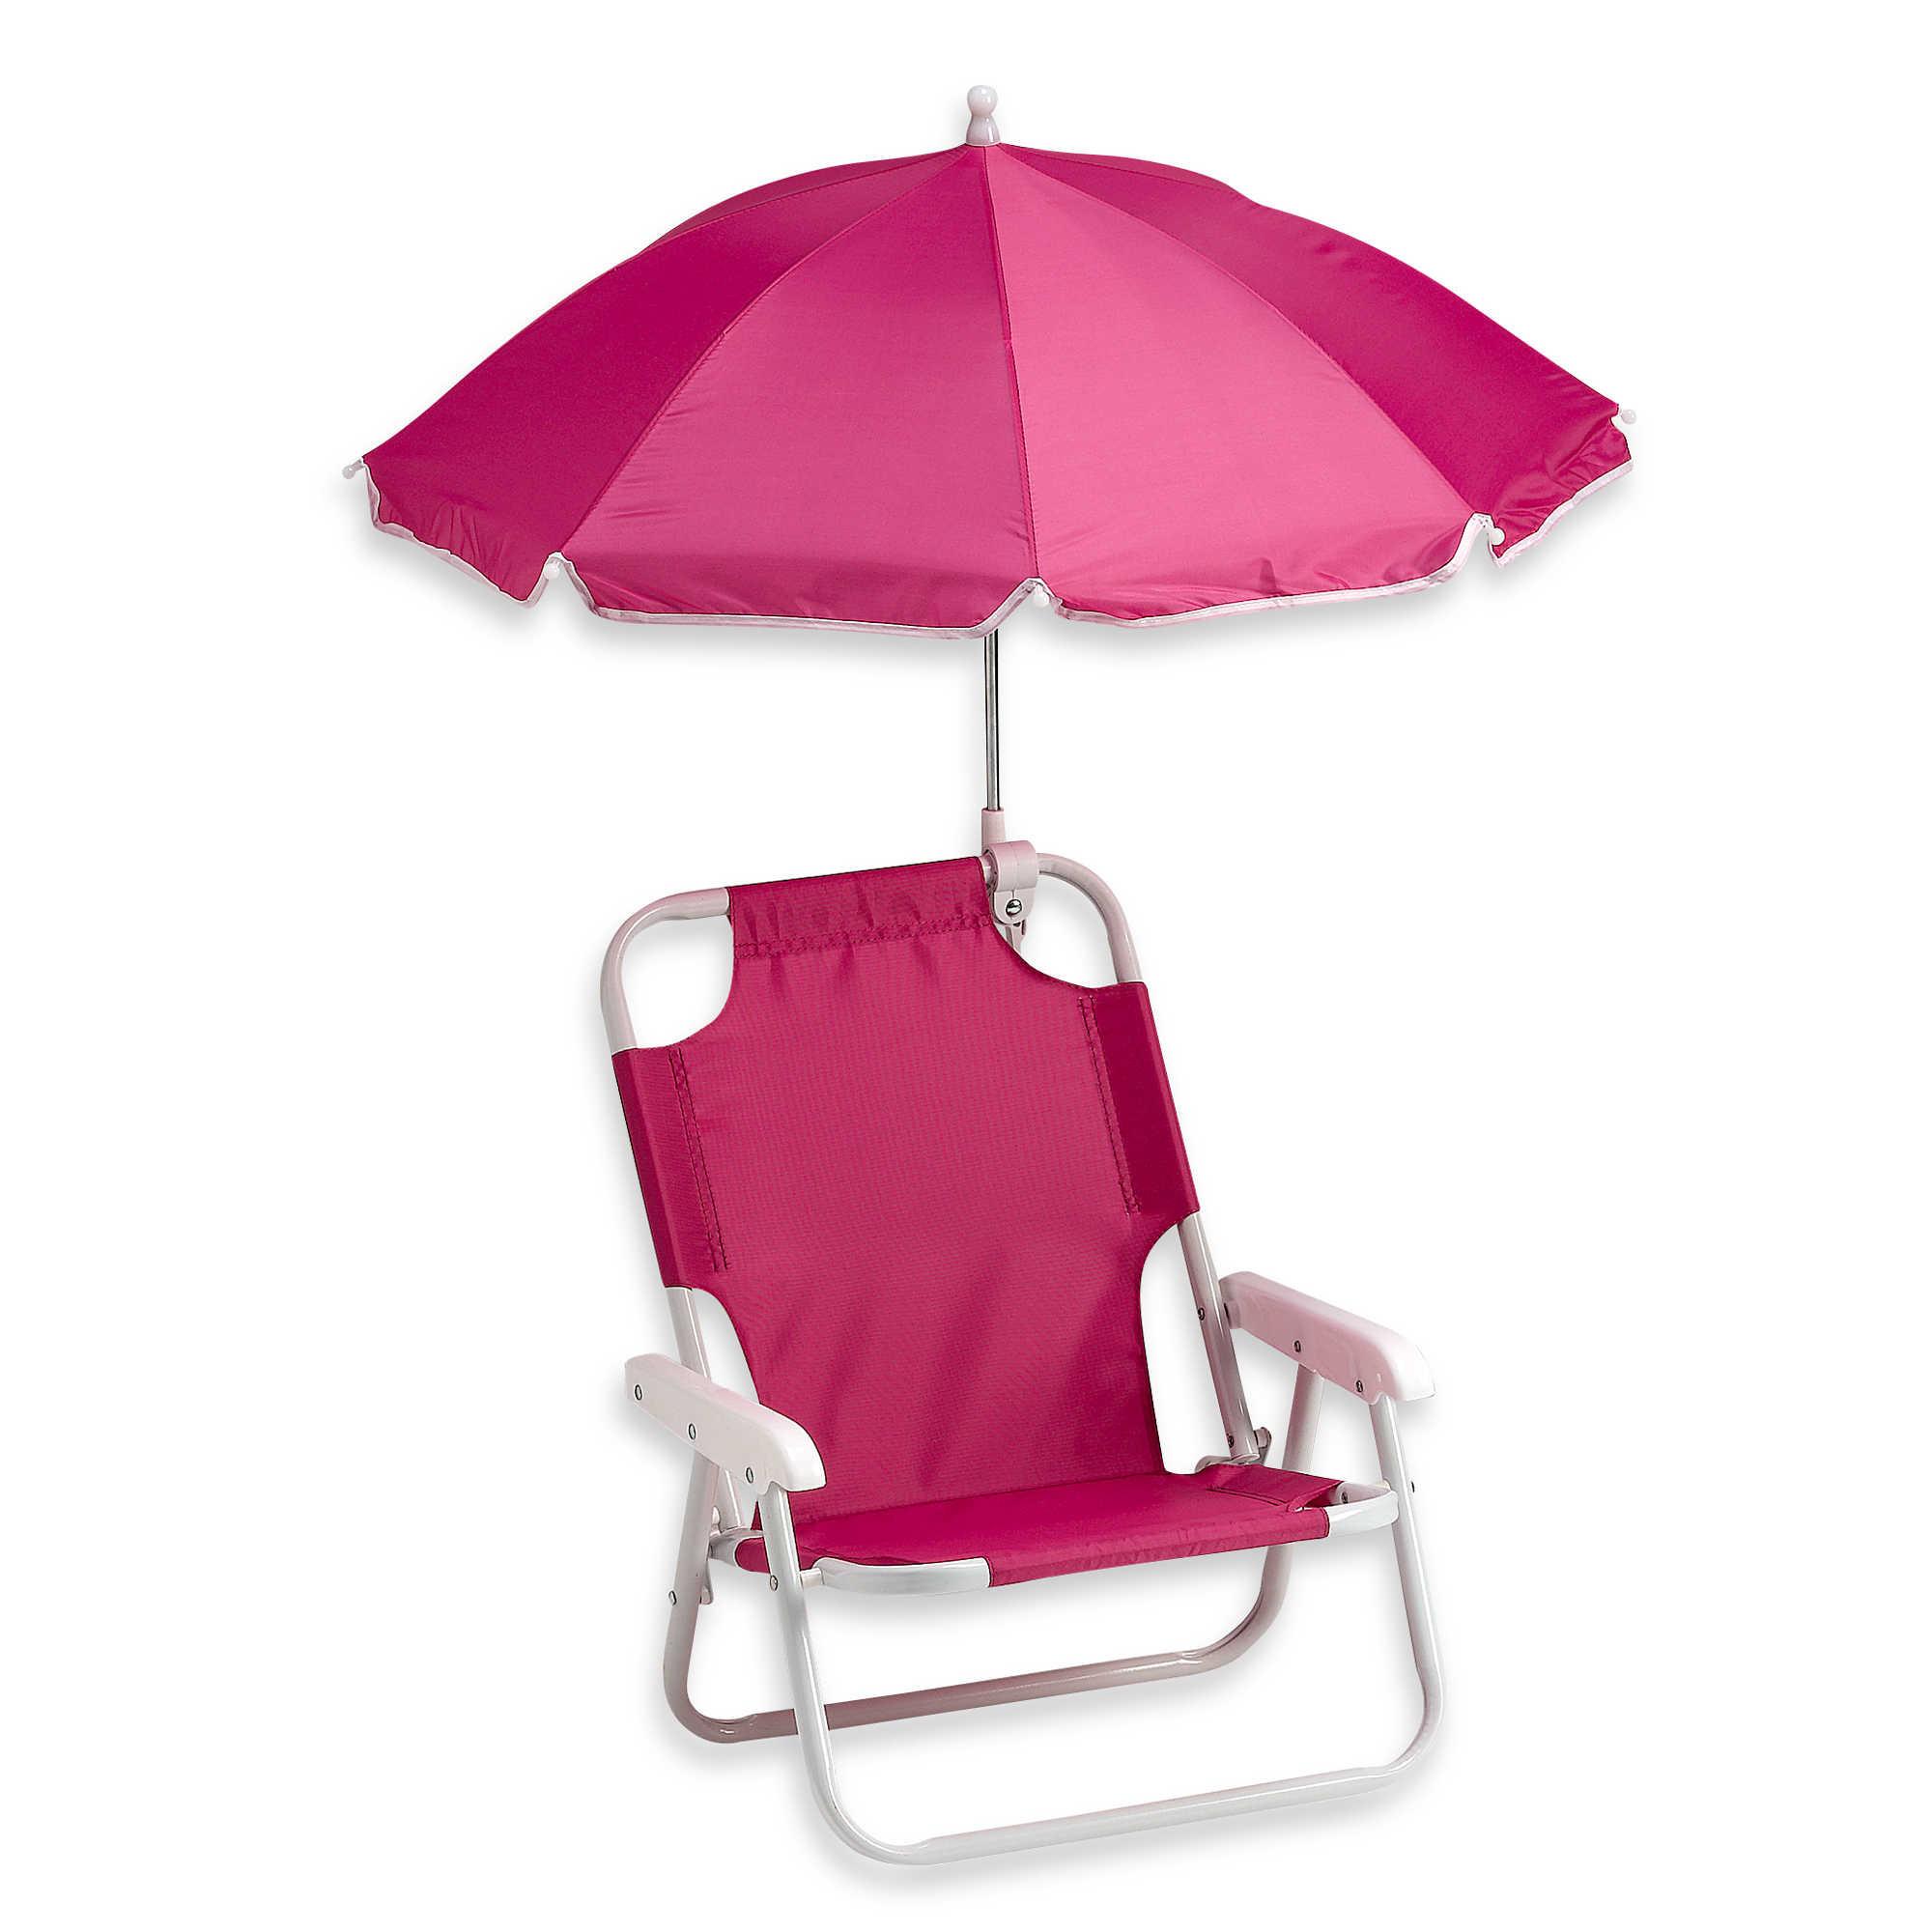 Kids Beach Chair With Umbrella  Folding Beach Chair with Umbrella Purple Pumpkin Gifts